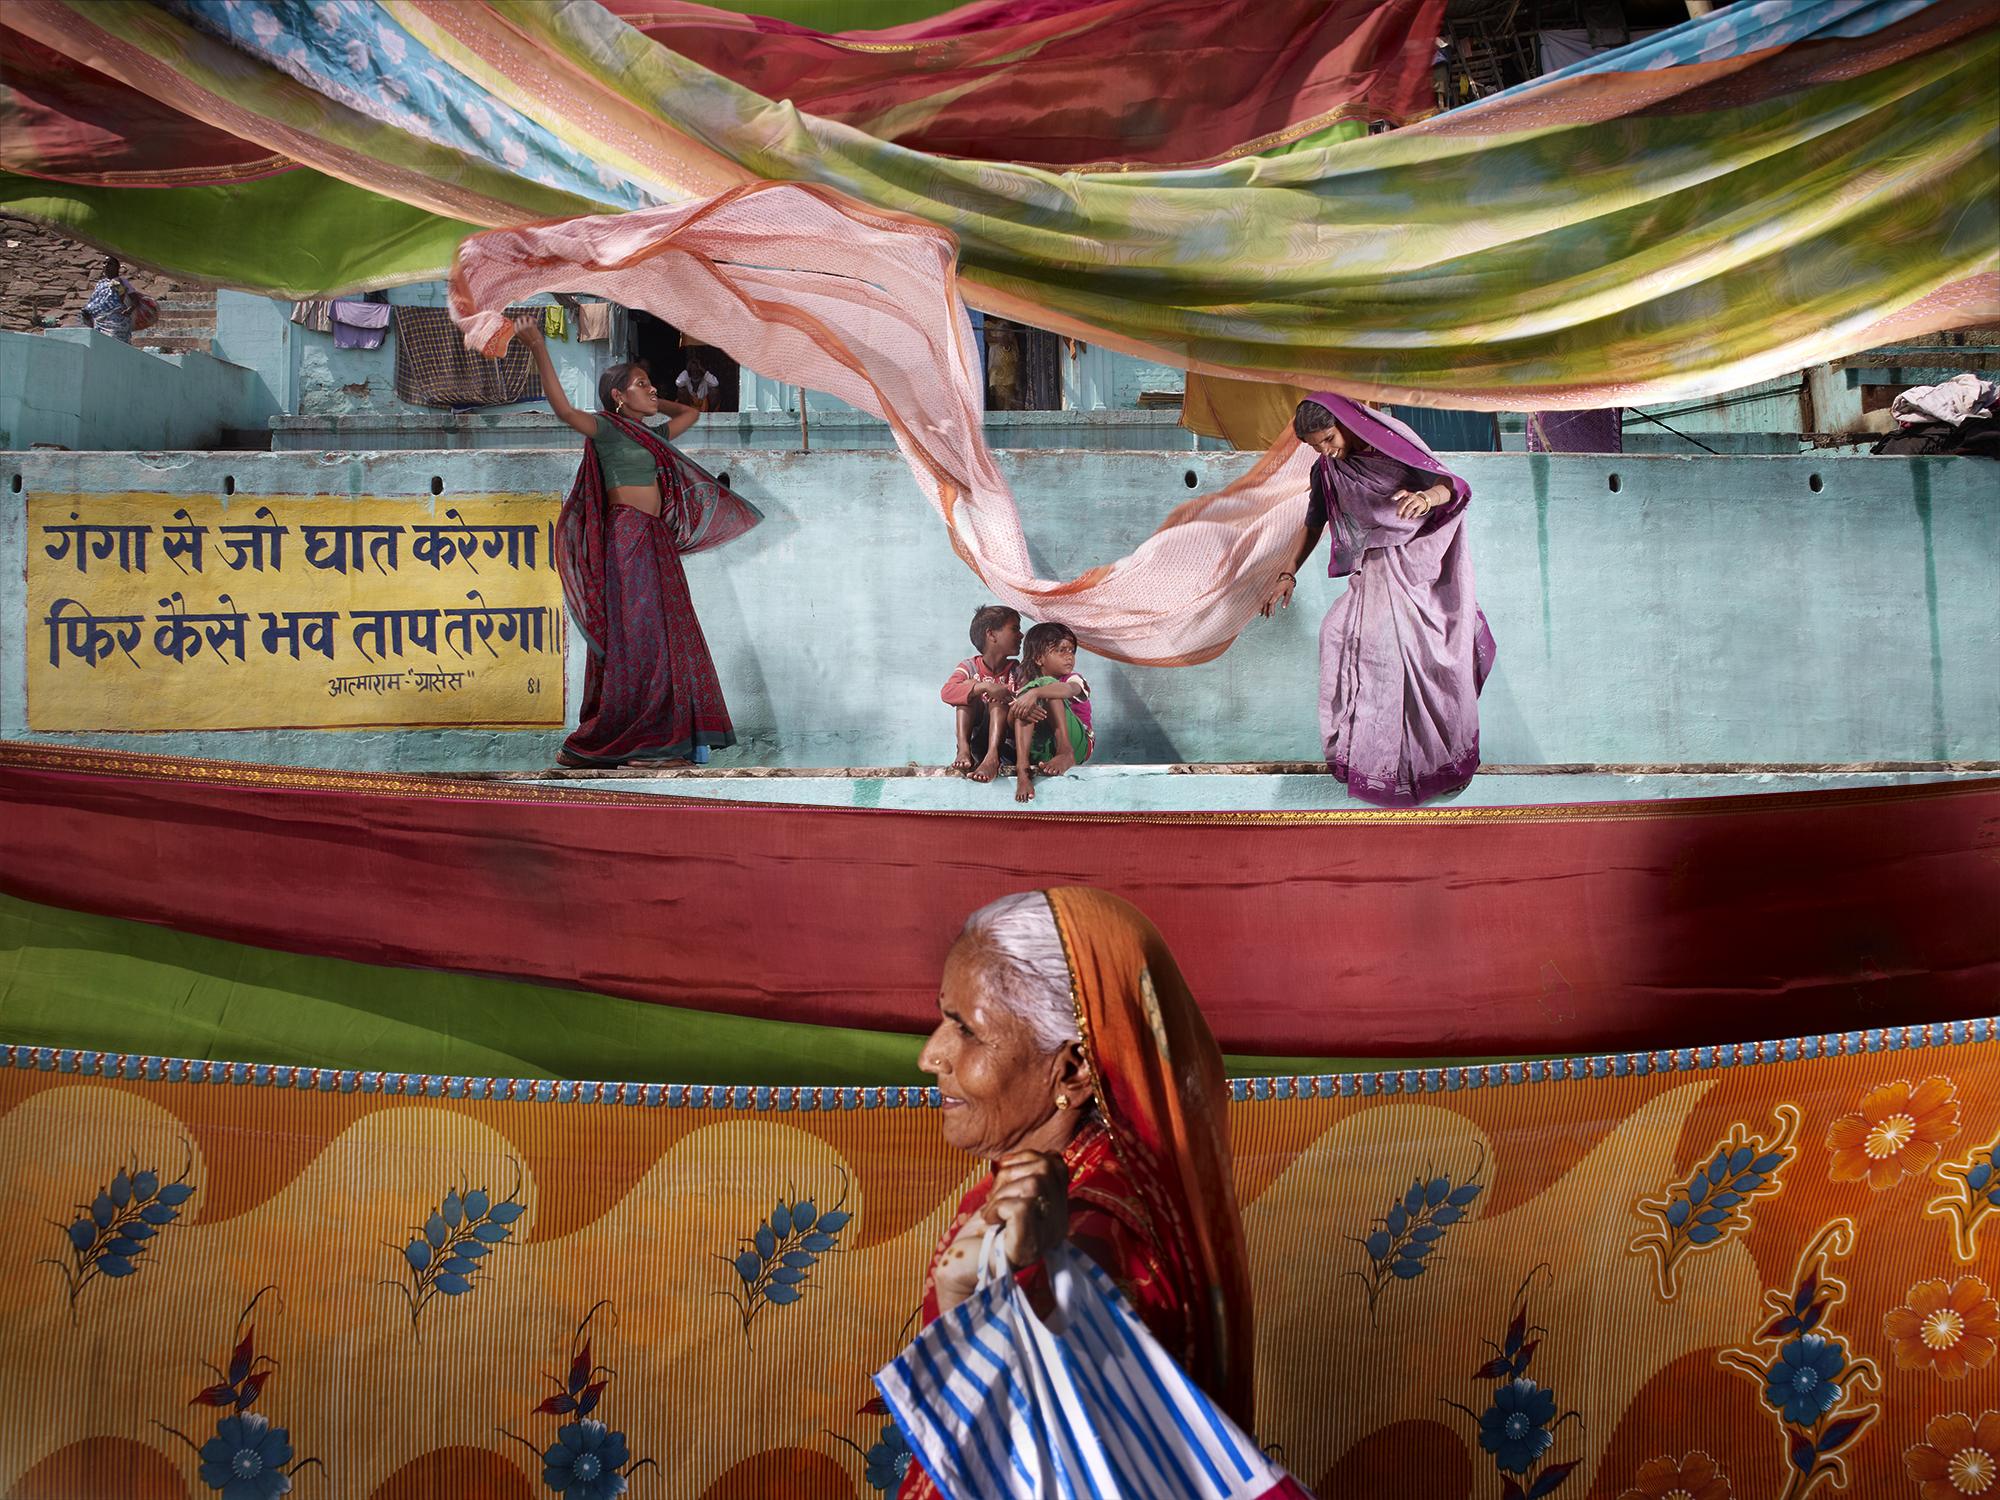 NicolasHenry_SarisAuBordDuGange_VaranasiInde.jpg